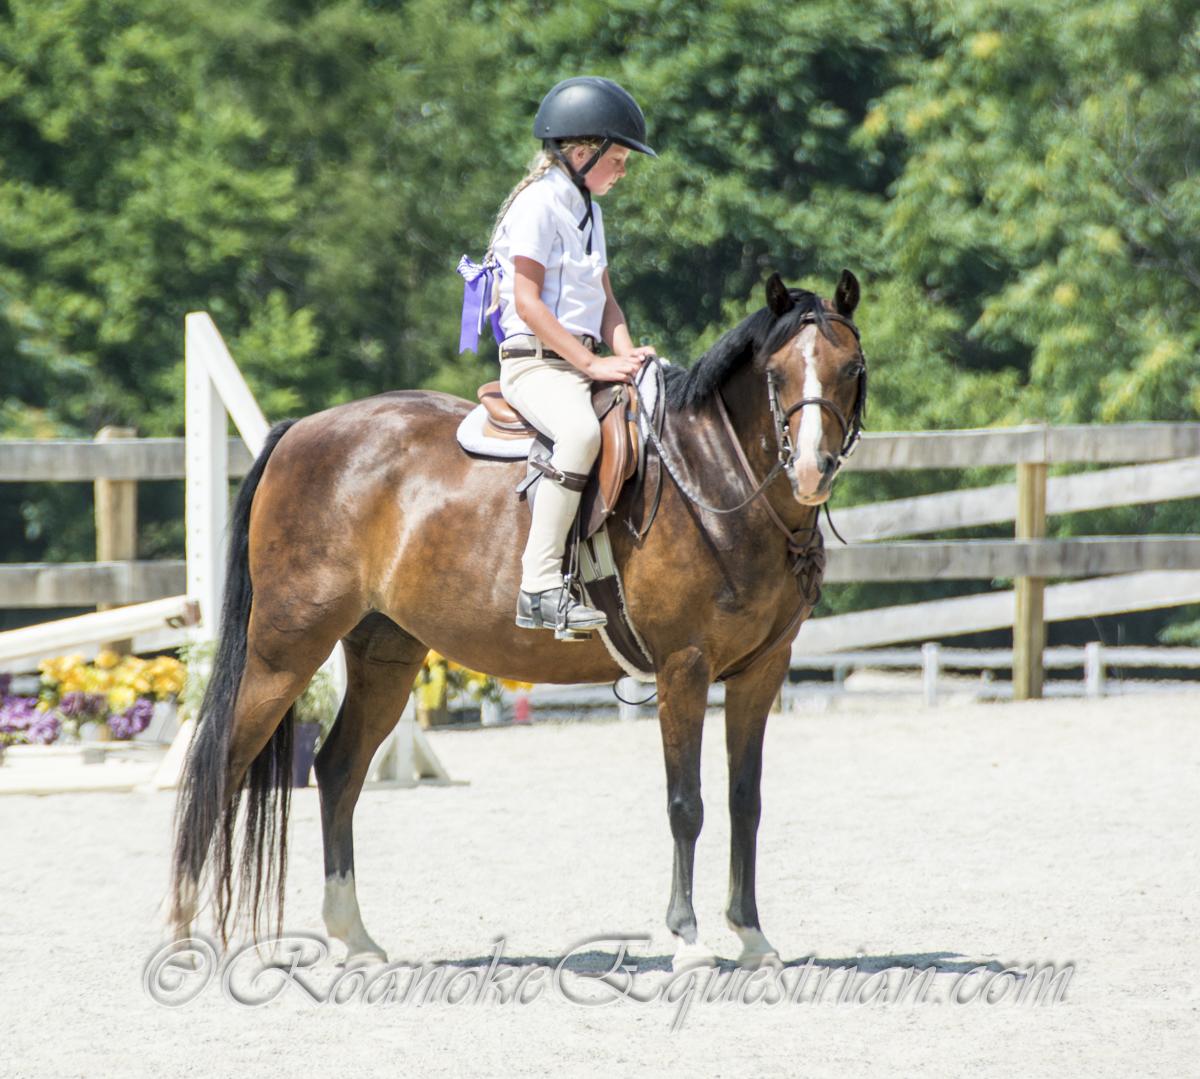 2020 Calendar Roanoke Equestrian